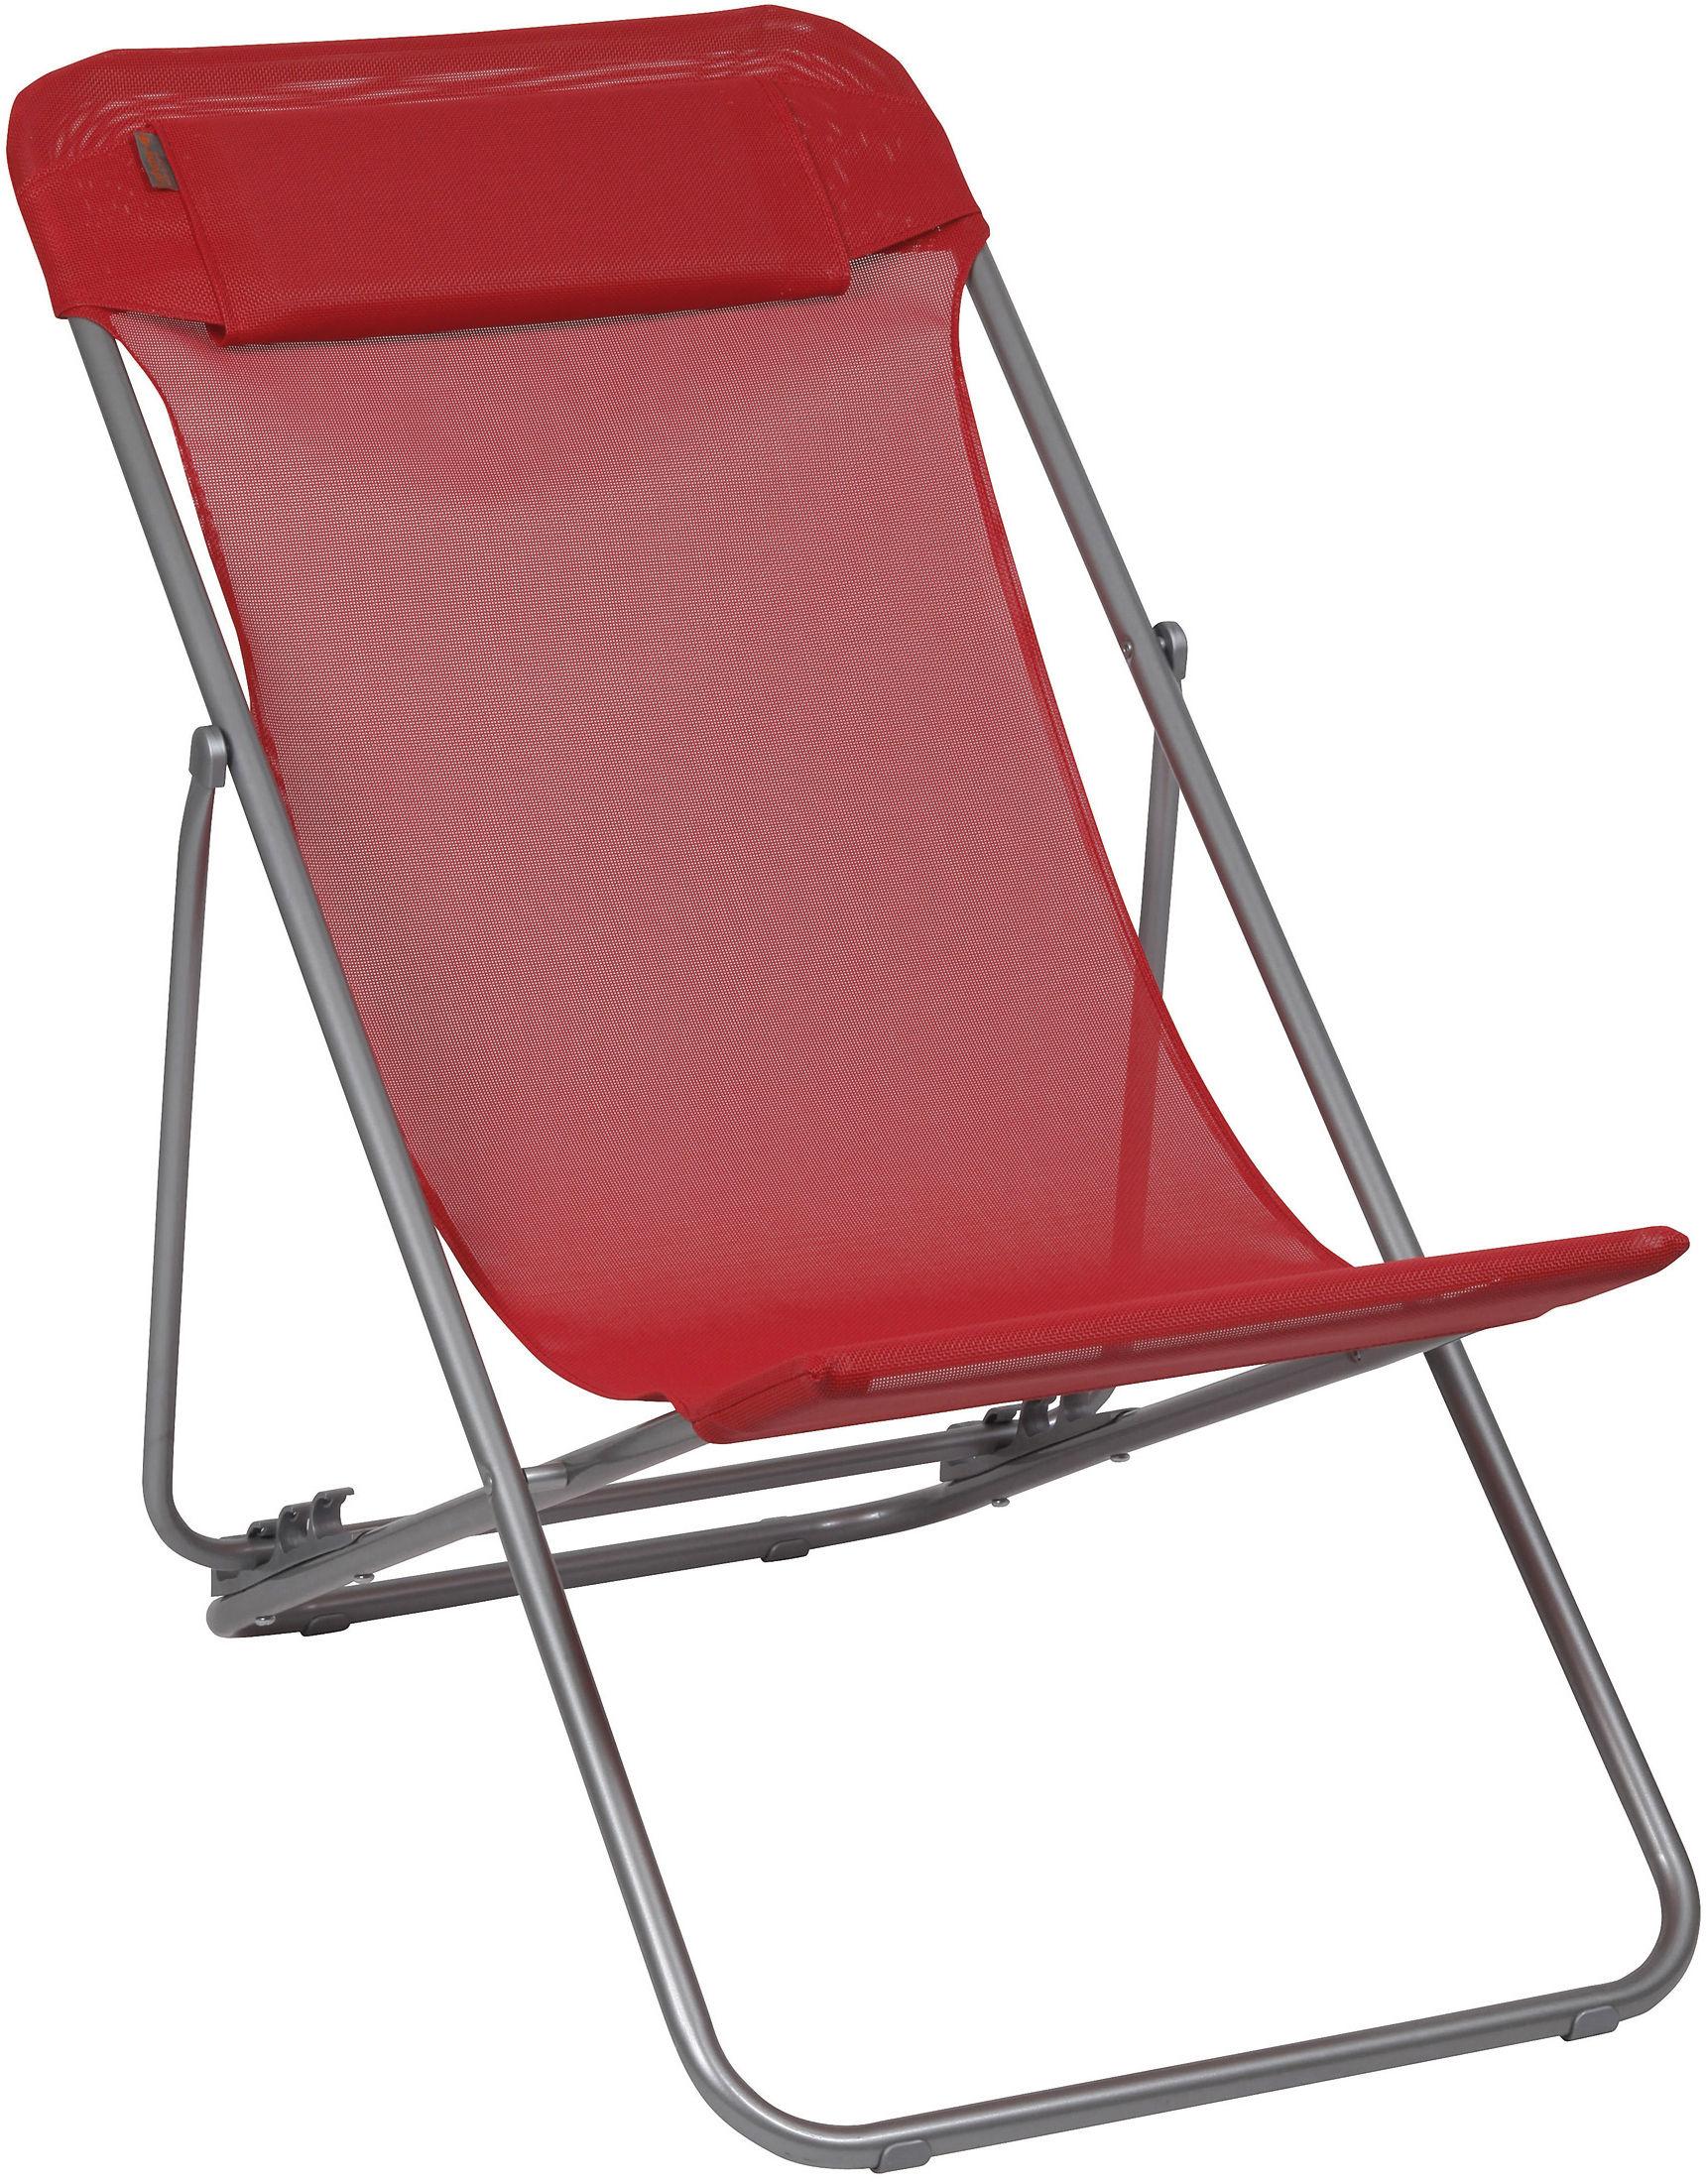 chaise longue transaluxe pliable 4 positions avec t ti re coquelicot structure grise. Black Bedroom Furniture Sets. Home Design Ideas